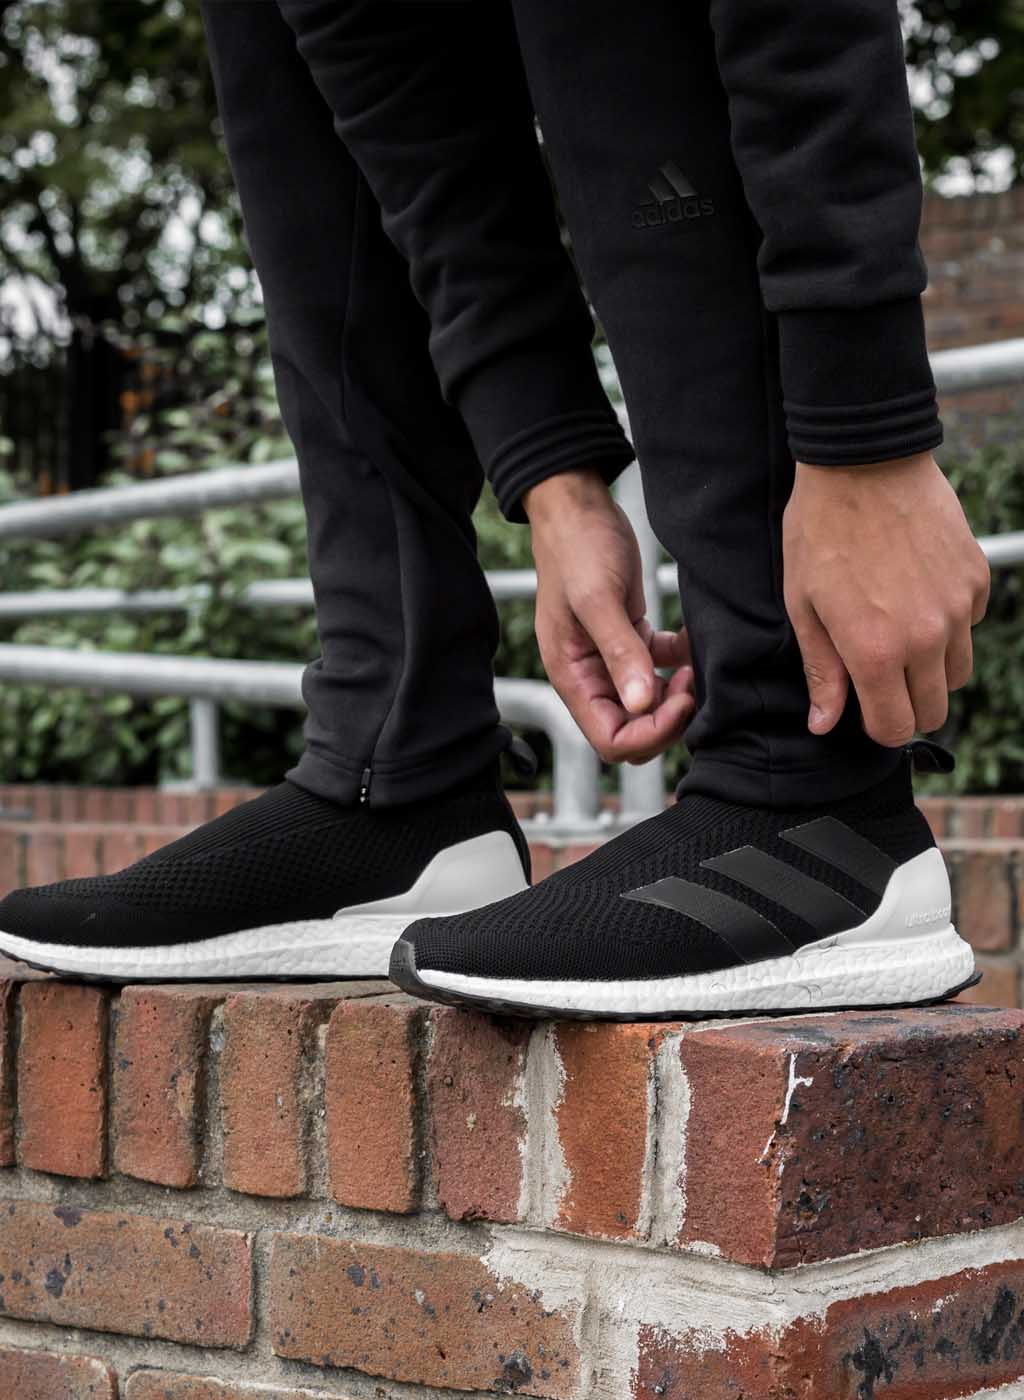 adidas-ace-ultraboost-multi-7-min.jpg